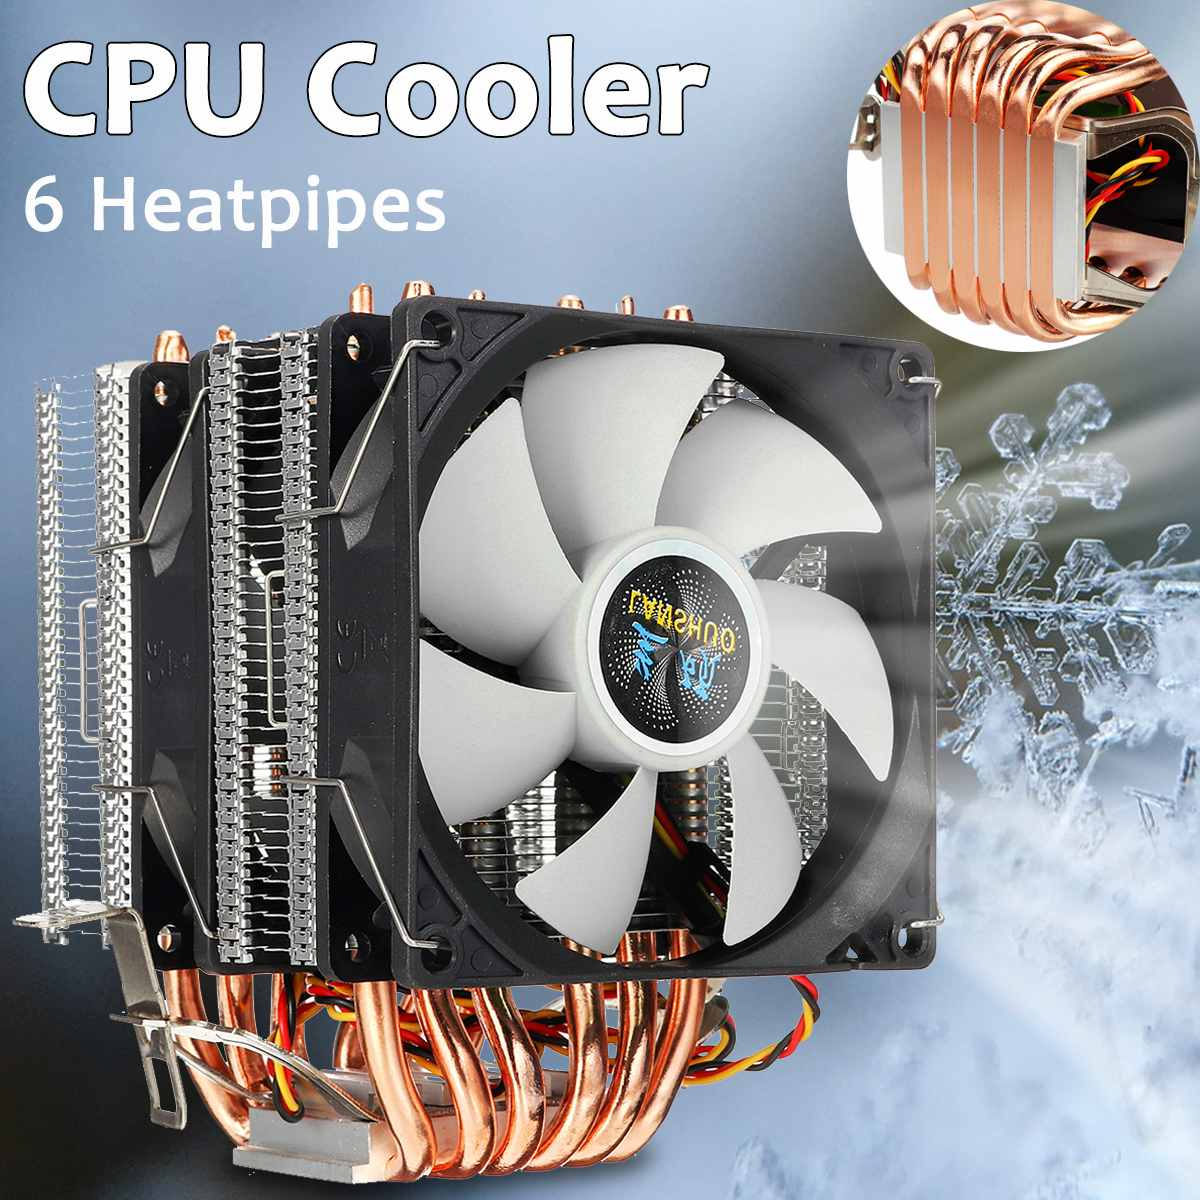 6 Heat Pipes CPU Cooler Dual-side Fan Cooler Quiet Cooling Fan Heatsink Radiator For LGA 1150/1151/1155/1156/1366/775 For AMD